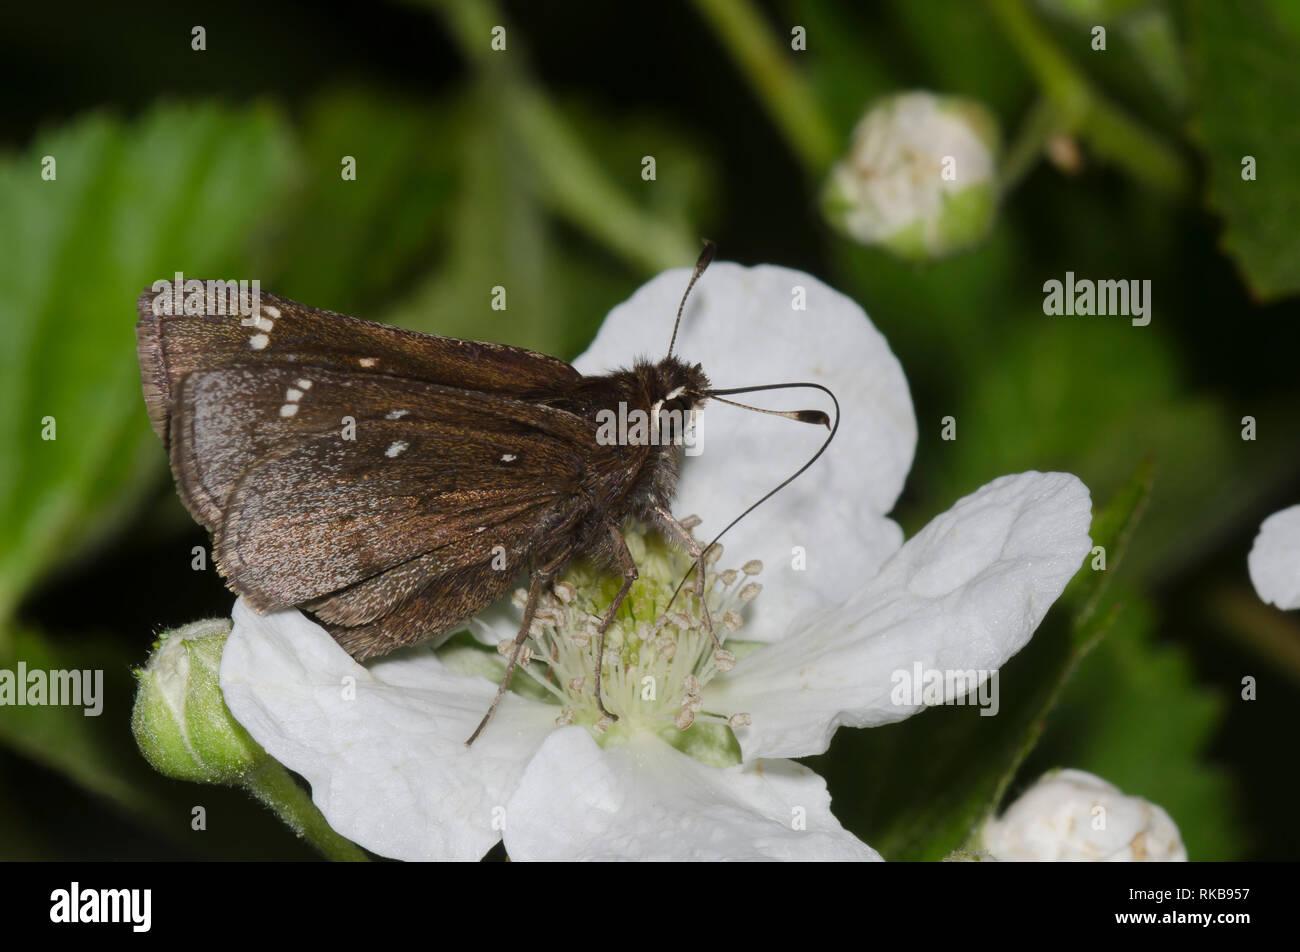 Dusted Skipper, Atrytonopsis hianna, nectaring from blackberry, Rubus sp., blossom - Stock Image